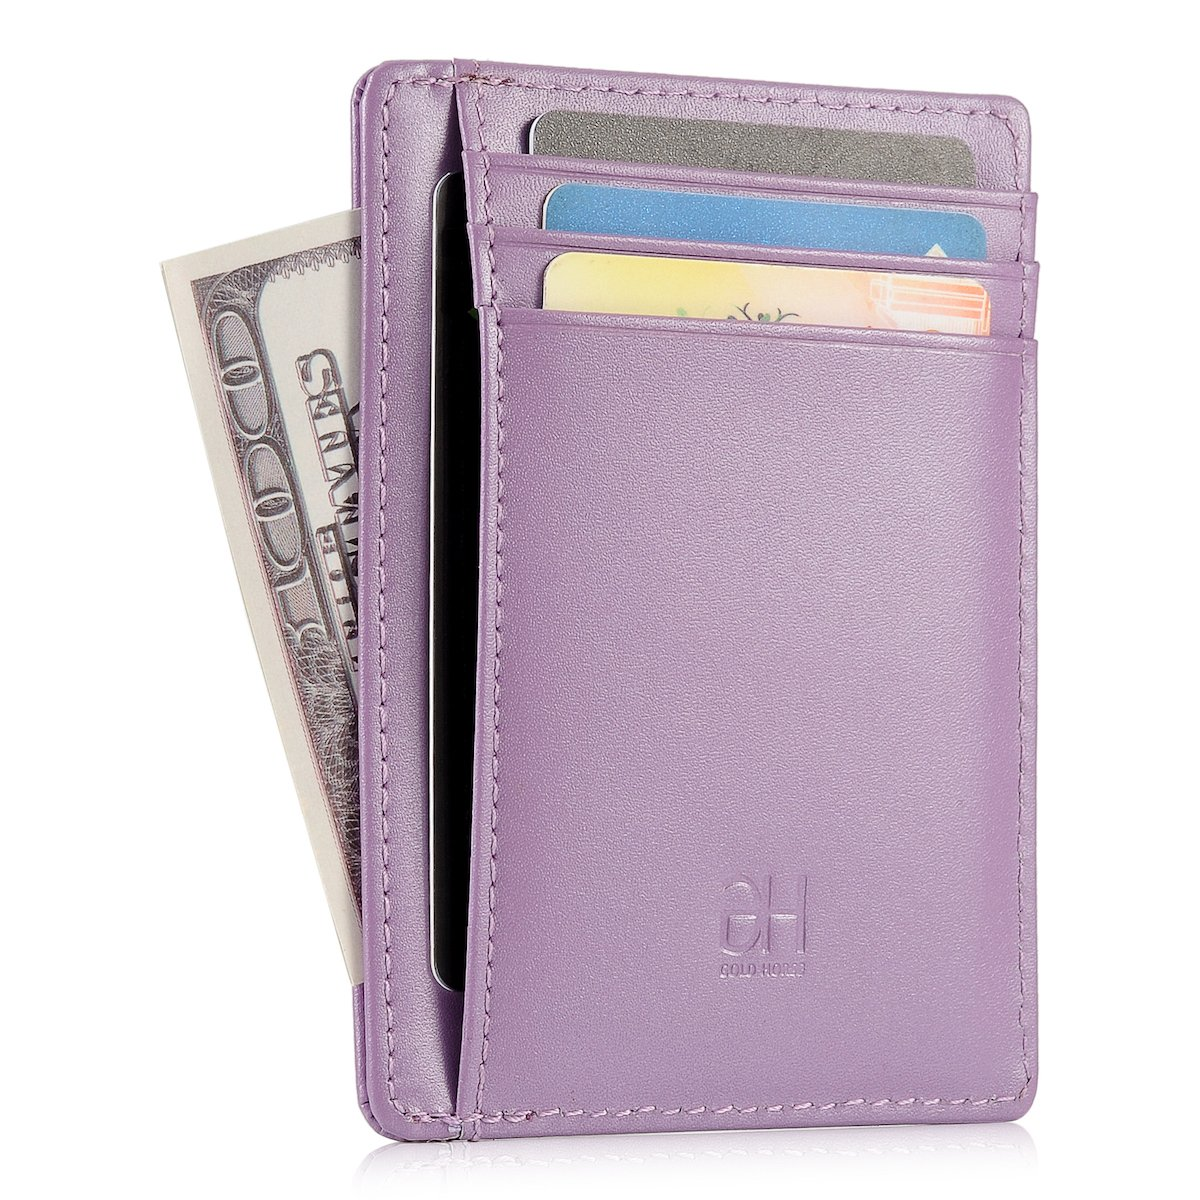 GH GOLD HORSE Slim RFID Blocking Card Holder Minimalist Leather Front Pocket Wallet for Women (Light Purple)